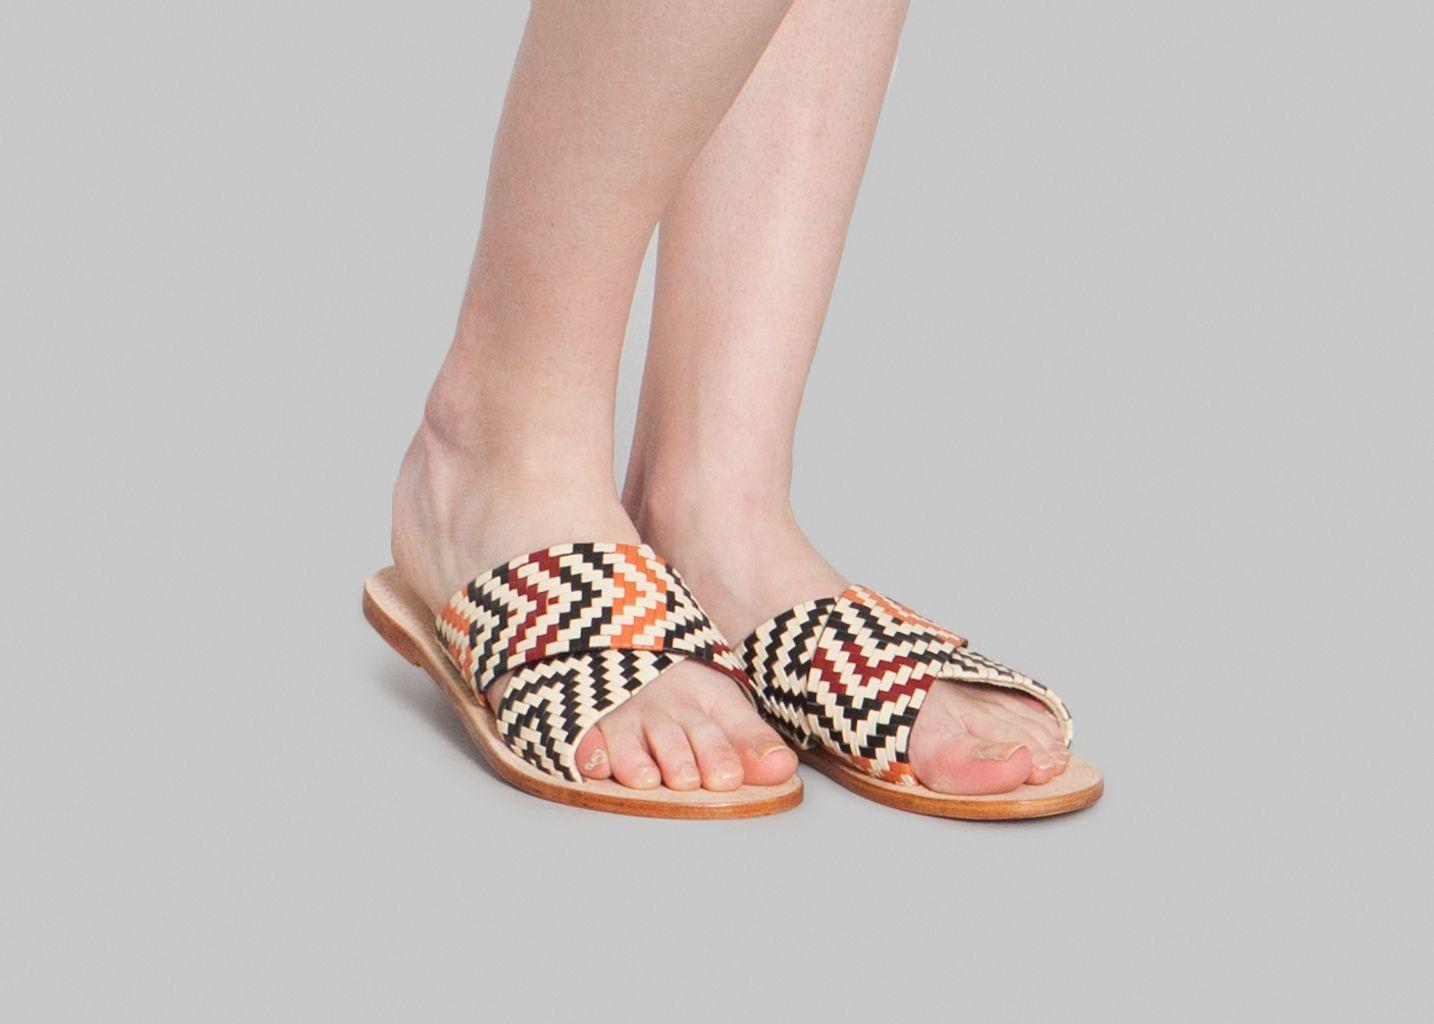 Sandals L'exception Antik Brown Batik Balko XwqH6xfznz